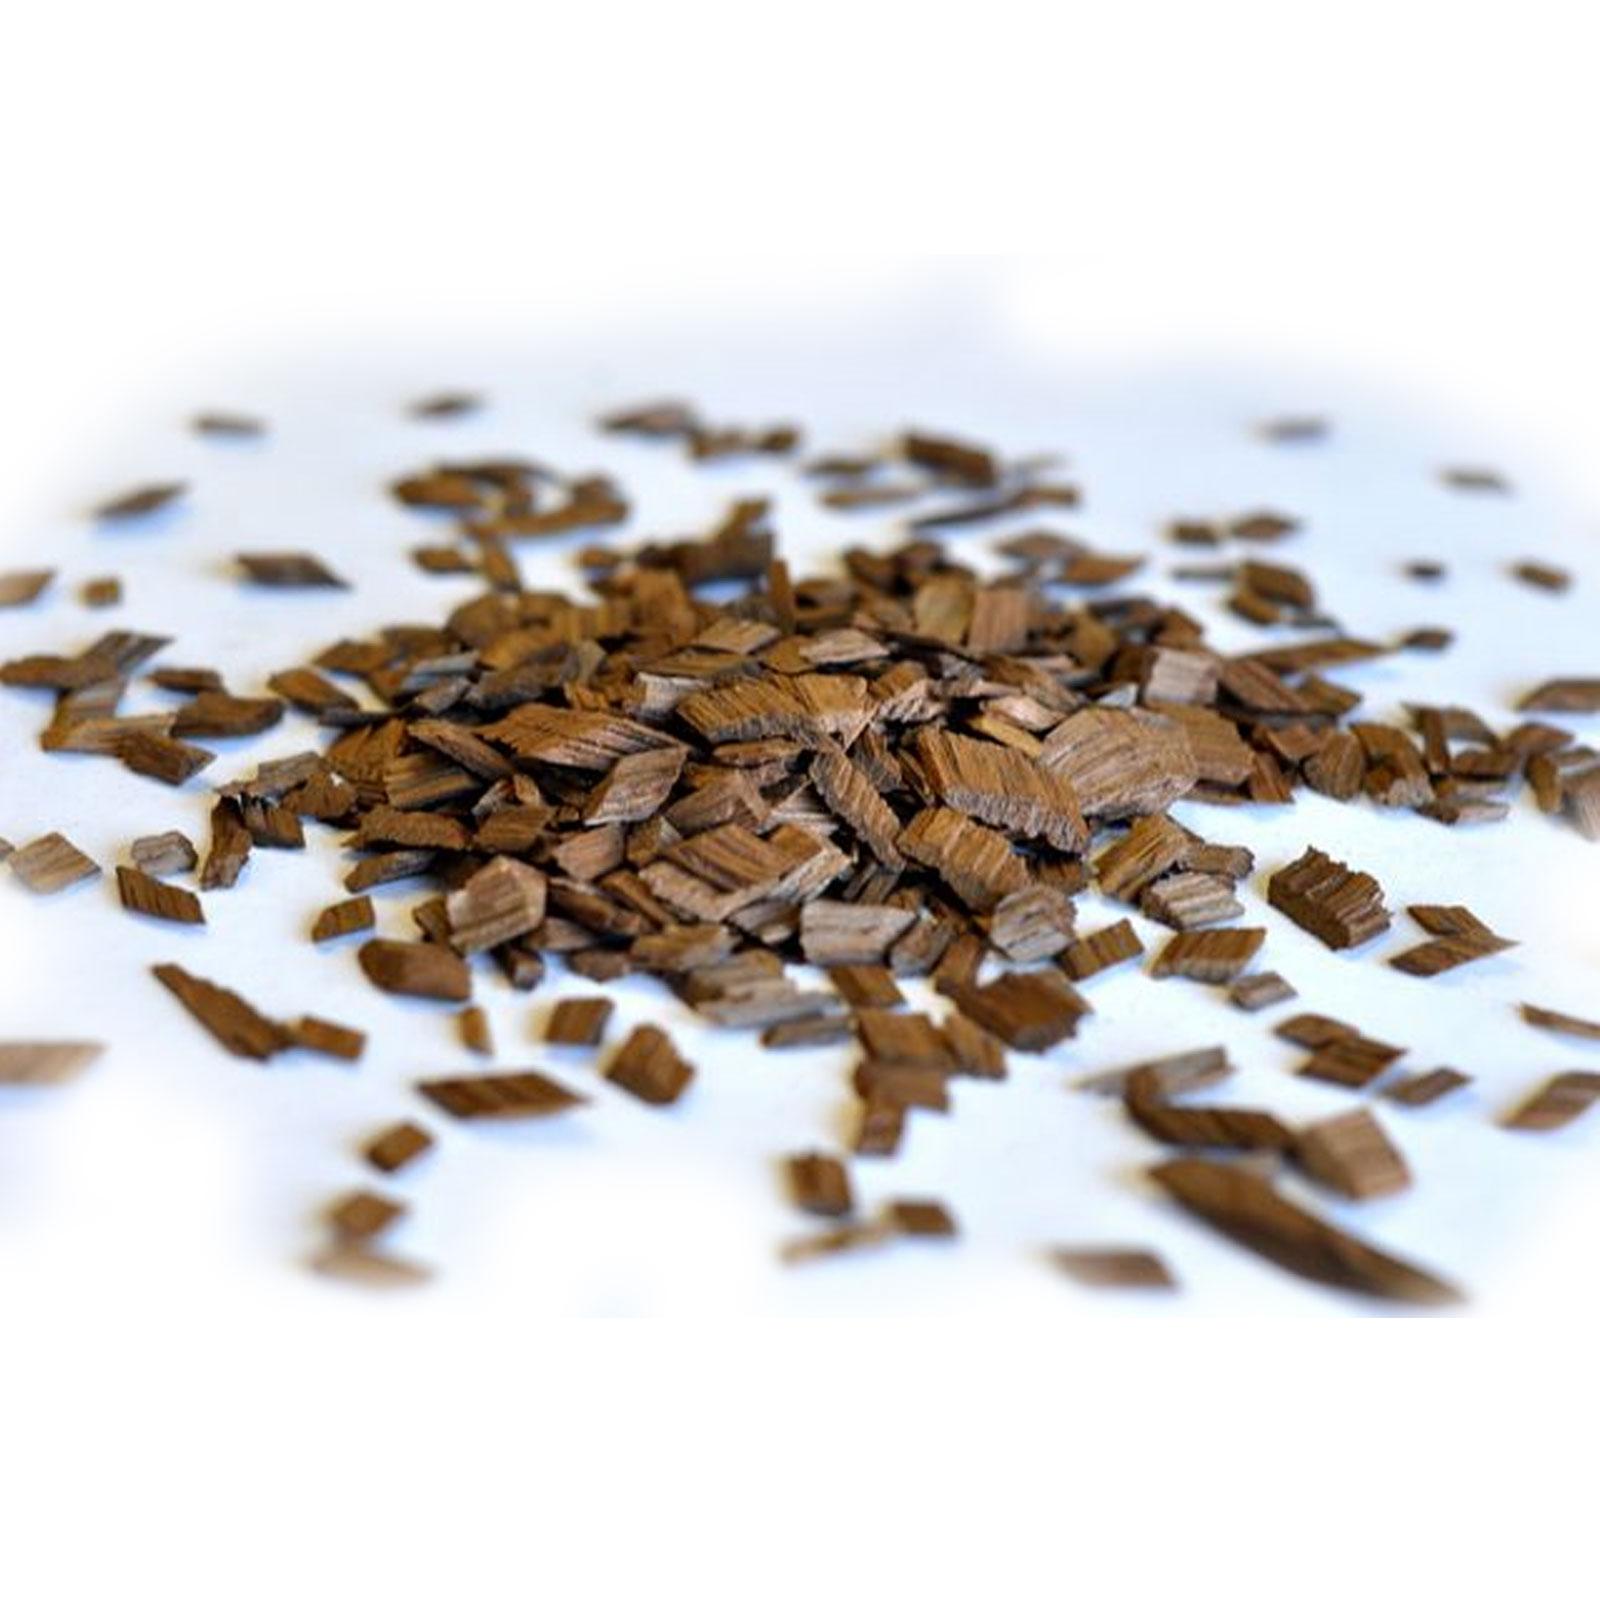 Oak Chips - Scaglie di quercia TOFFEE 250 gr